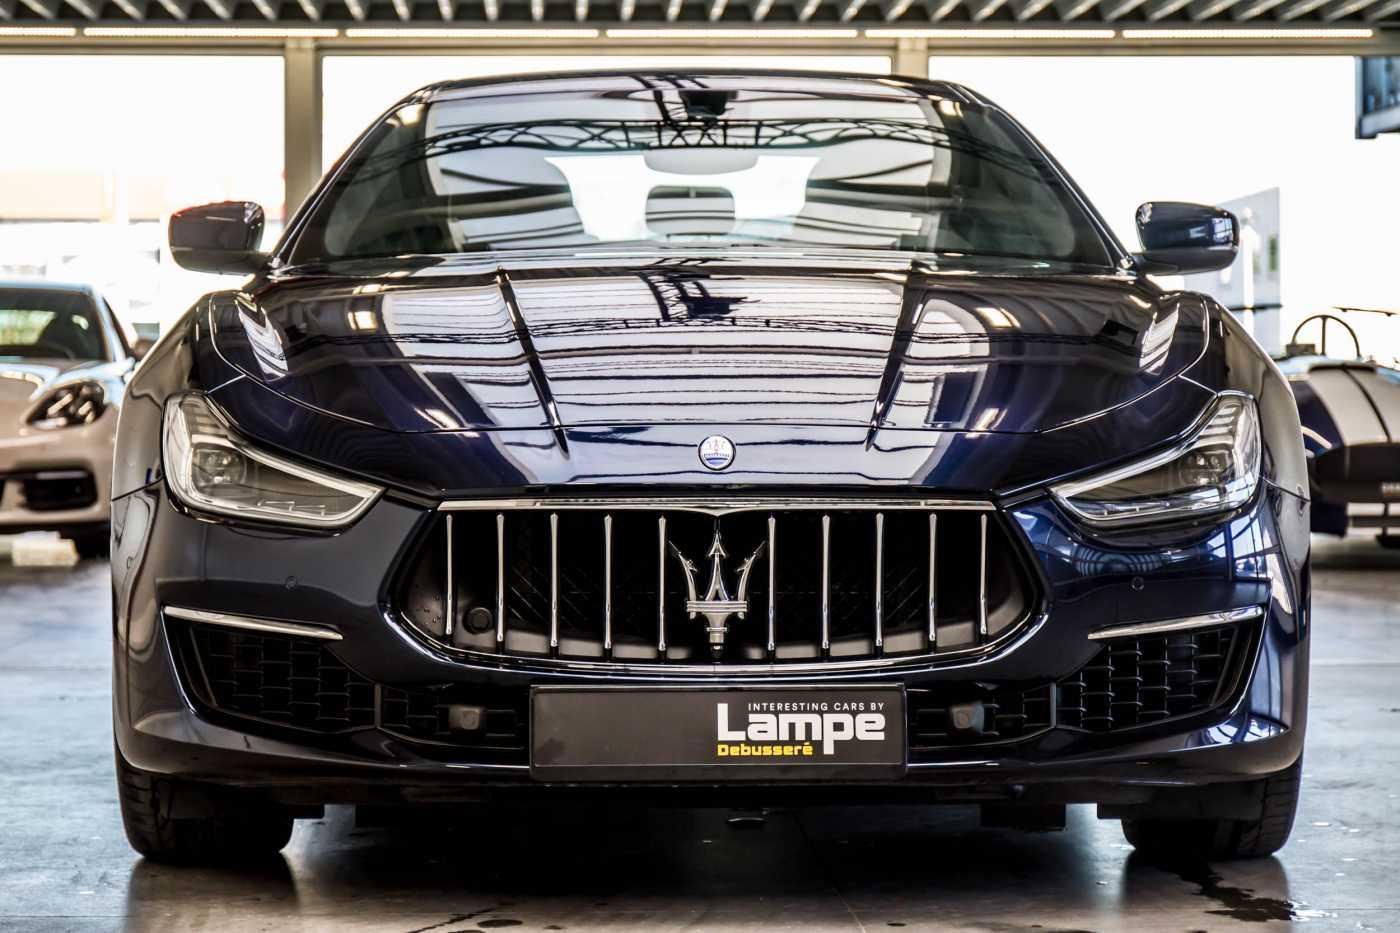 Maserati Ghibli Diesel GranLusso Keyless Sports Exhaust LED Camera 10/29